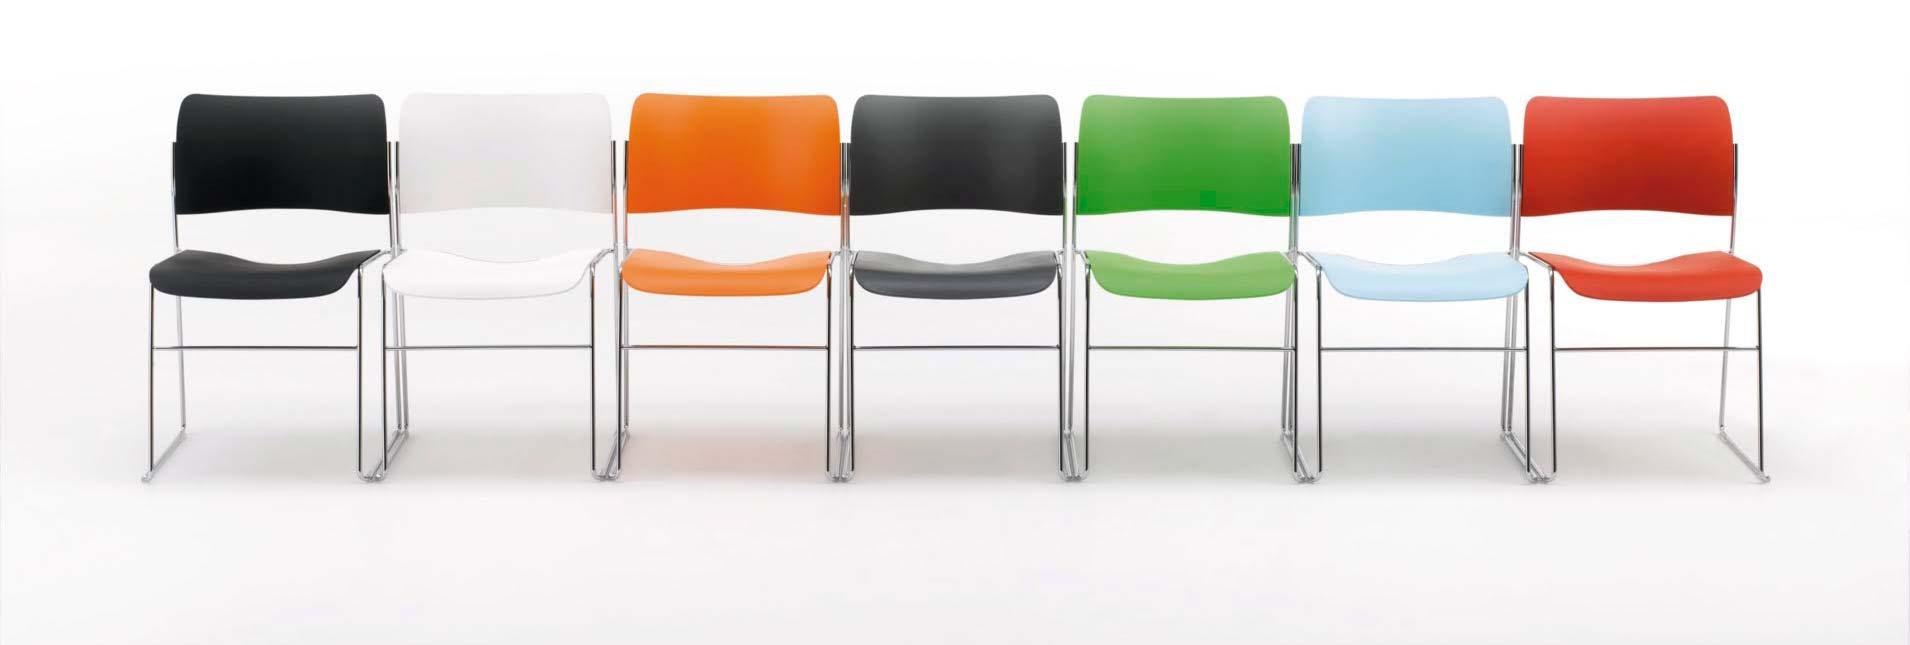 David Rowland 40 4 Chair